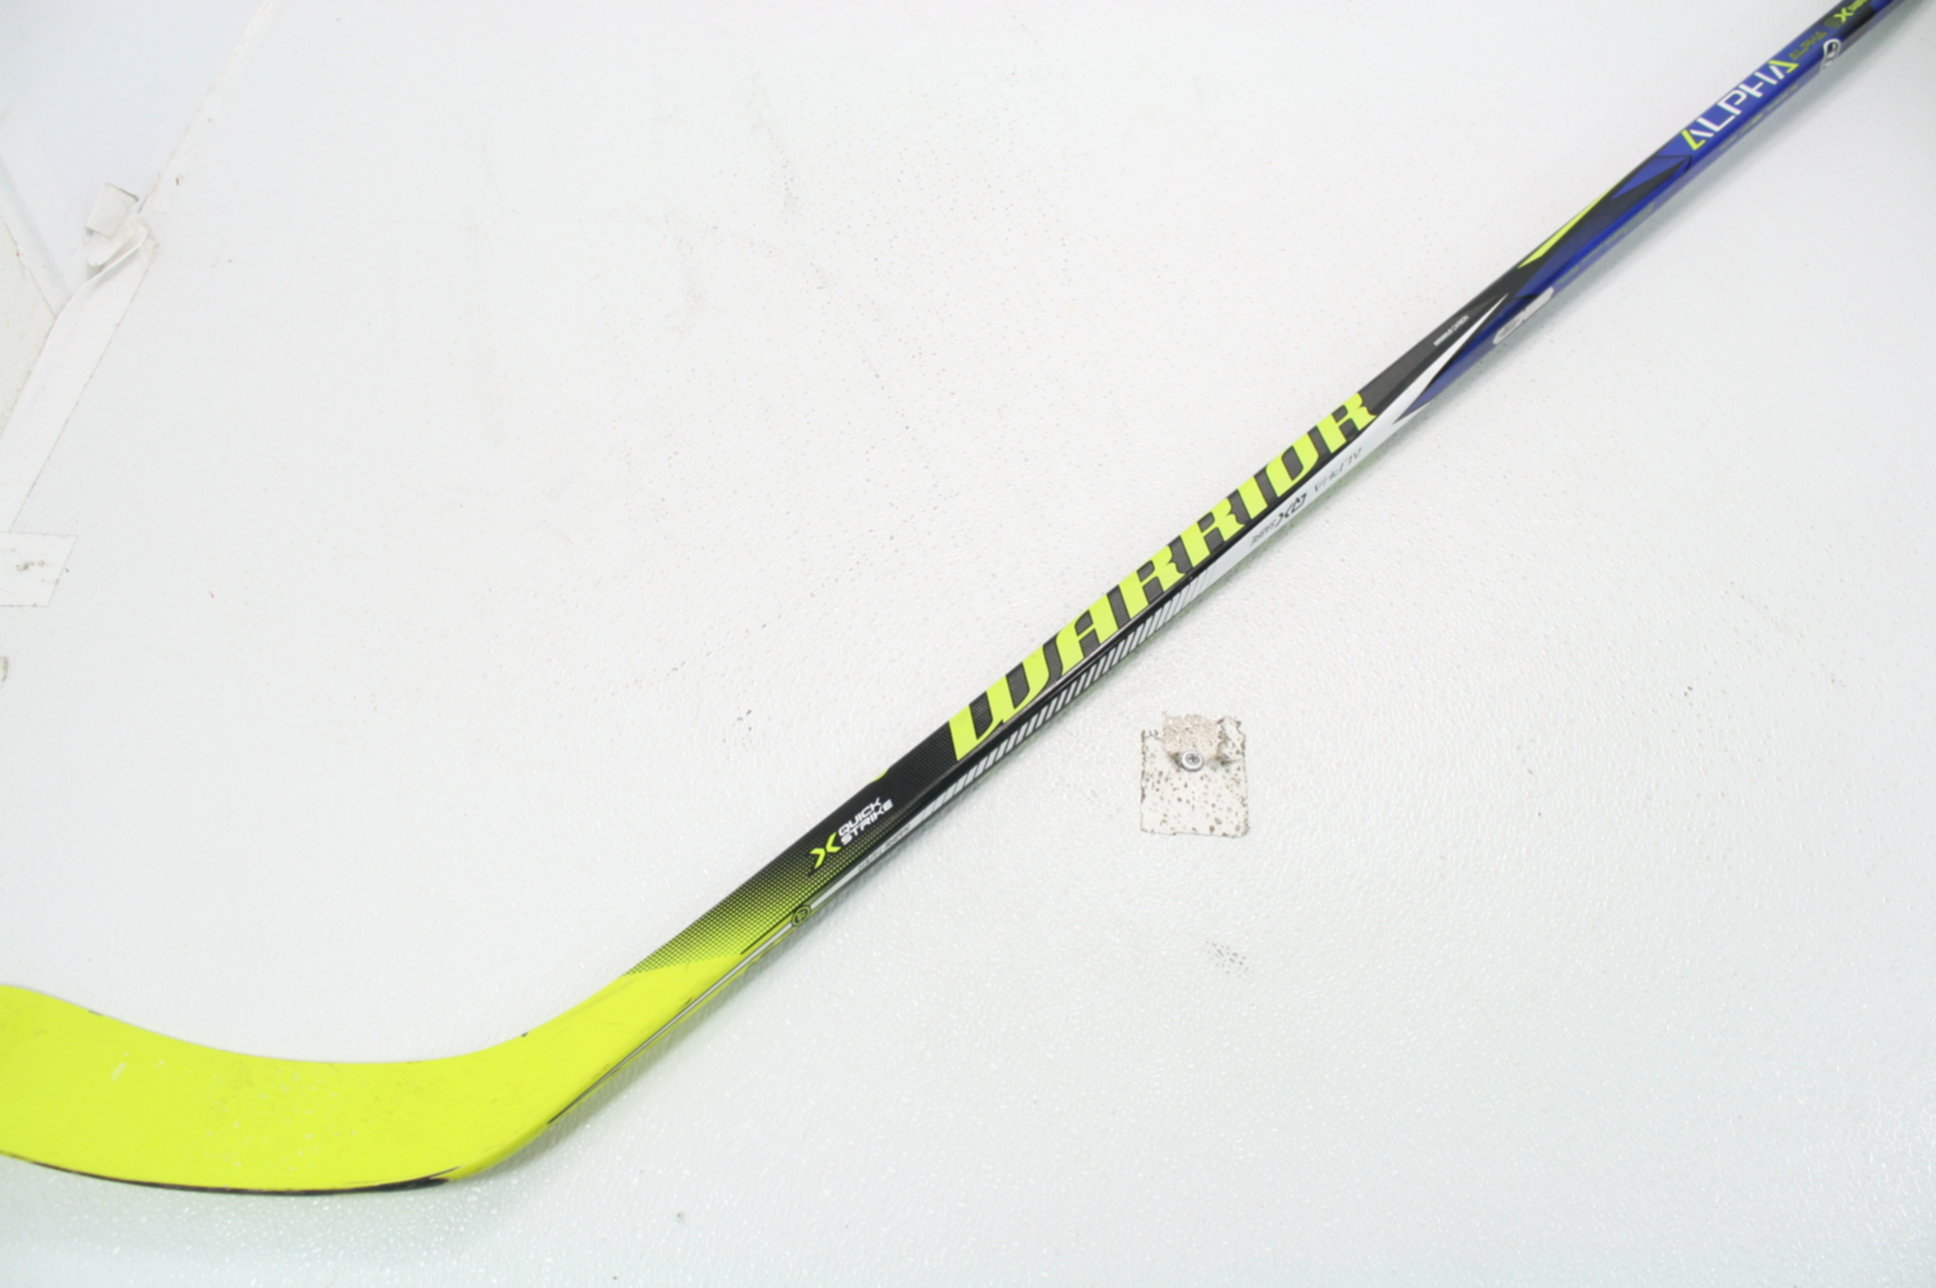 061bc559b33 Warrior Alpha QX Sabre Junior Hockey Stick True 1 Phantom Feel Sabre ...